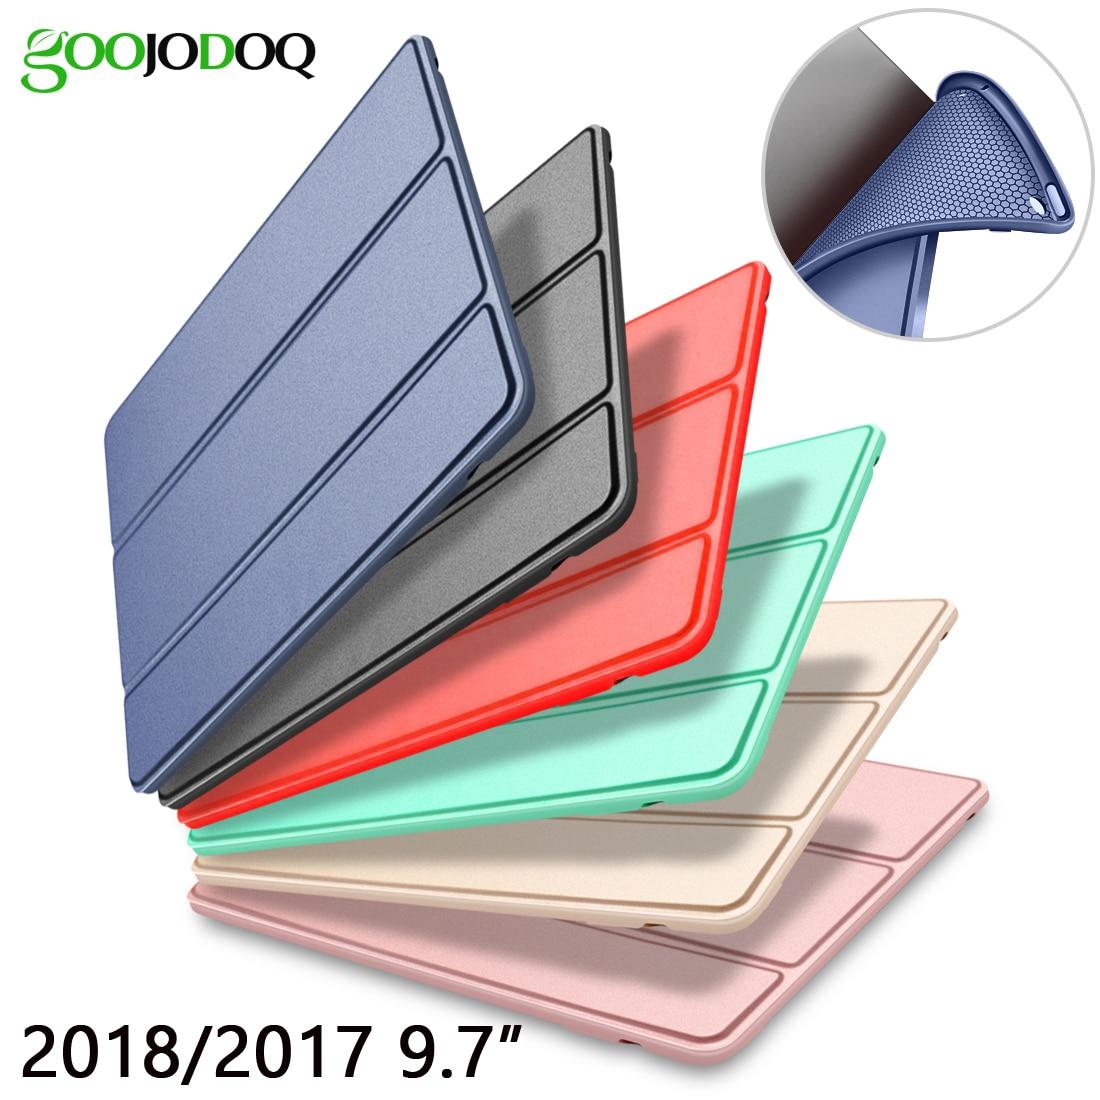 Für iPad 9,7 2017 2018 Fall A1822 A1893 Silikon Weiche Zurück PU Leder Smart Cover für iPad 2018 Fall 9,7 zoll 2017 Fall